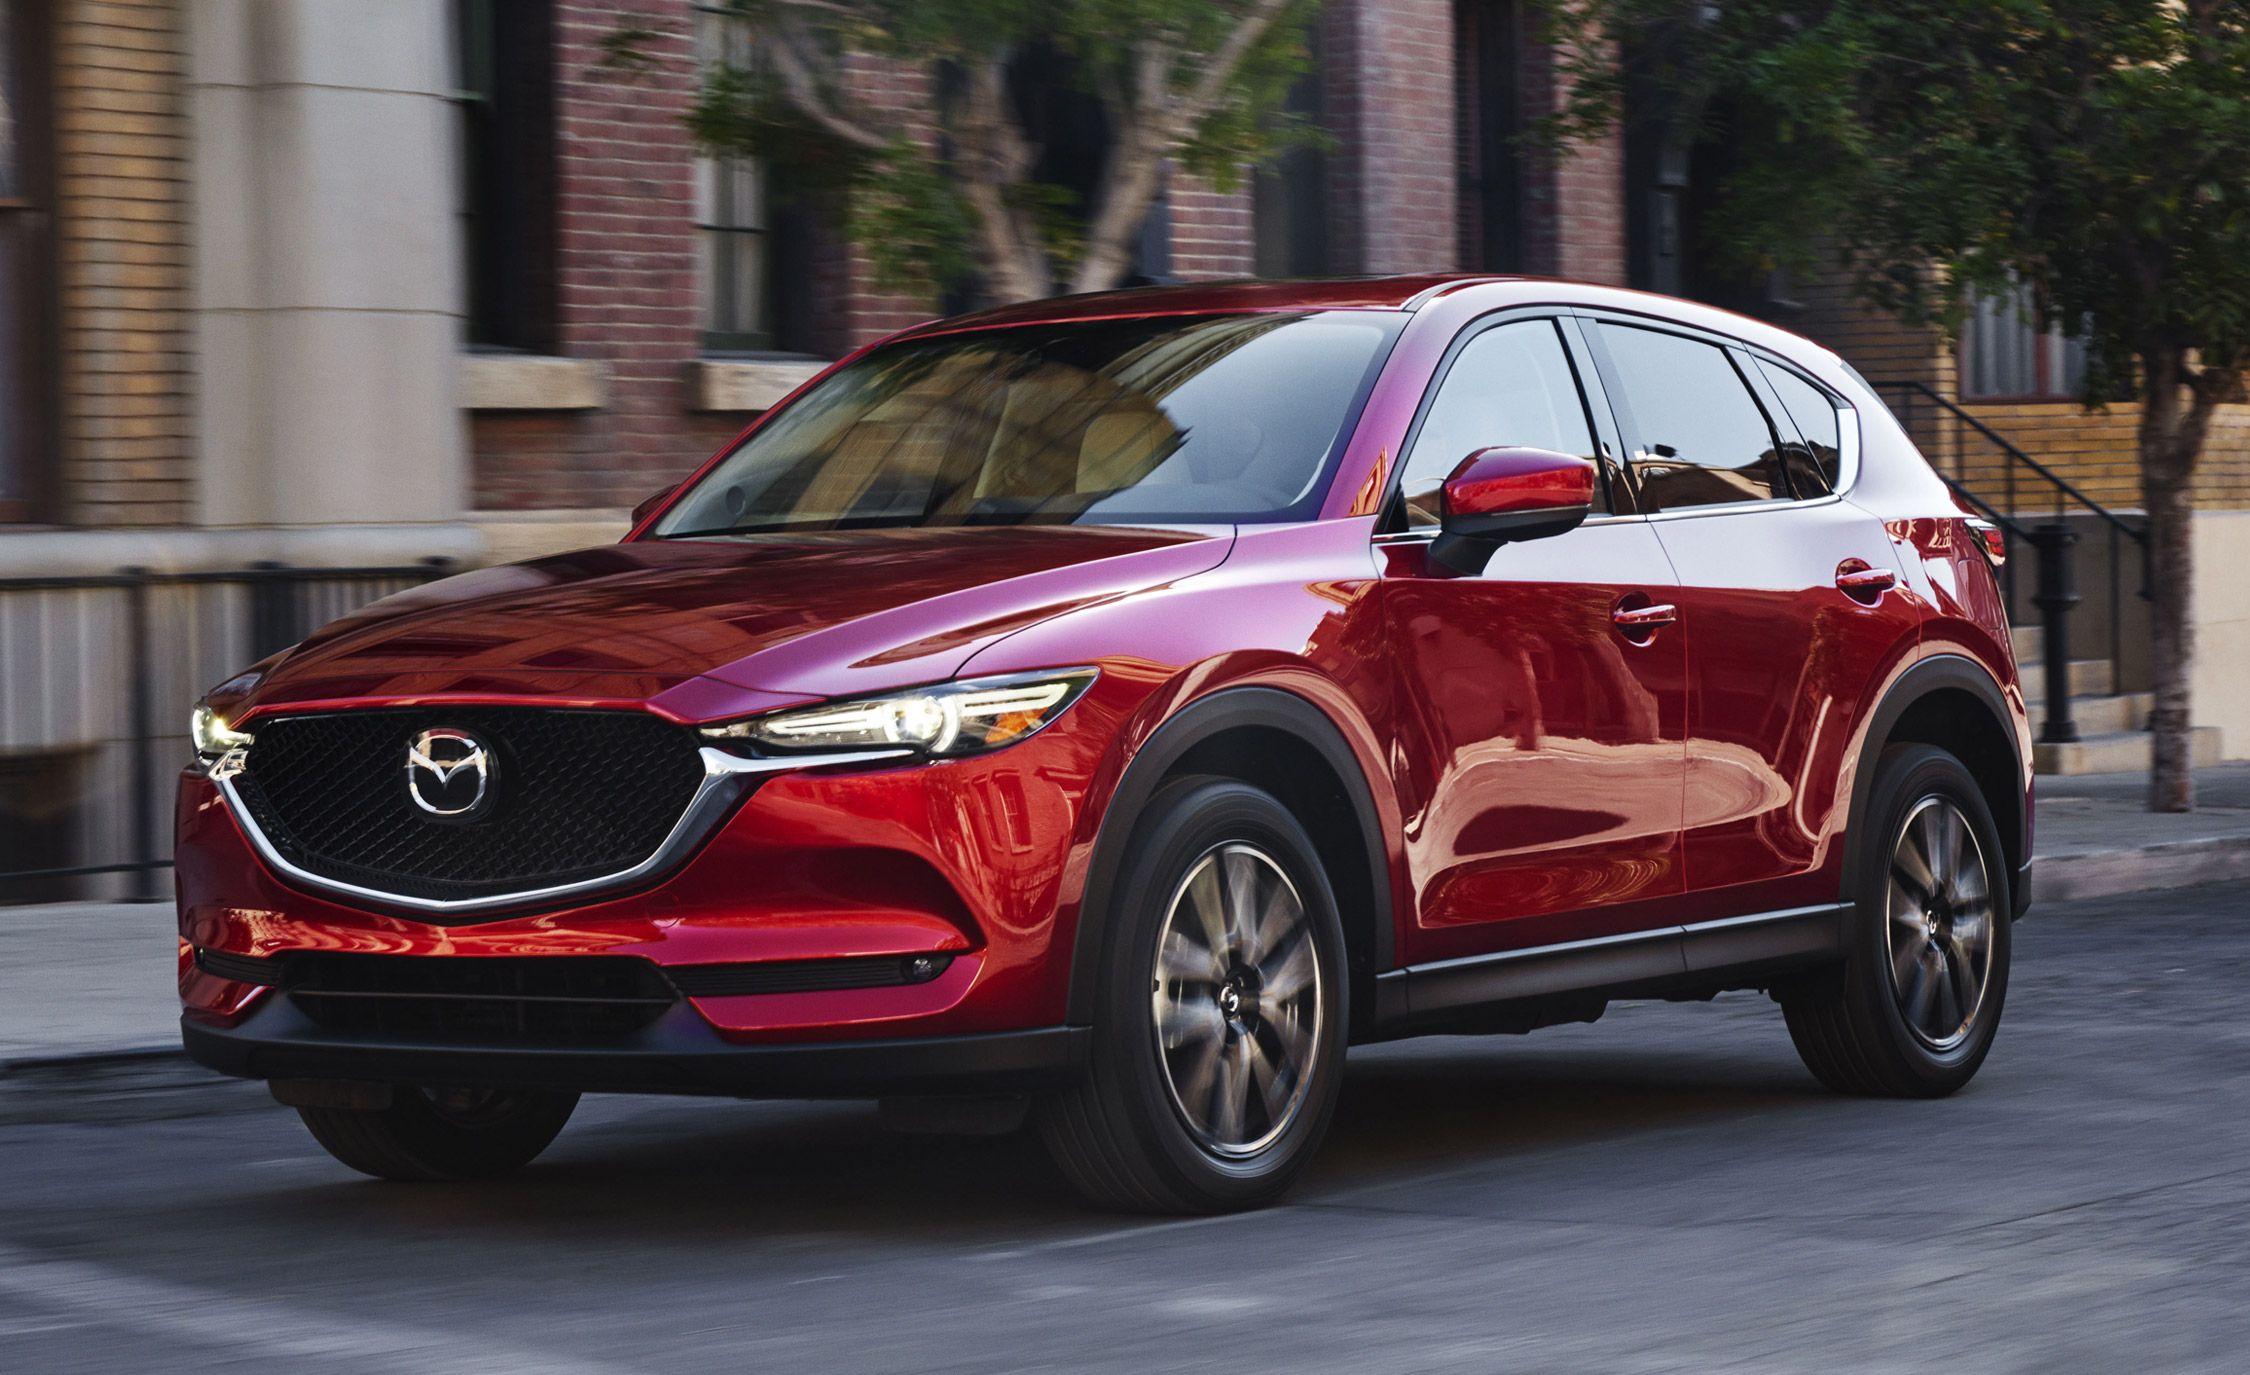 Mazda Cx 5 0 60 >> Mazda Cx 5 Reviews Mazda Cx 5 Price Photos And Specs Car And